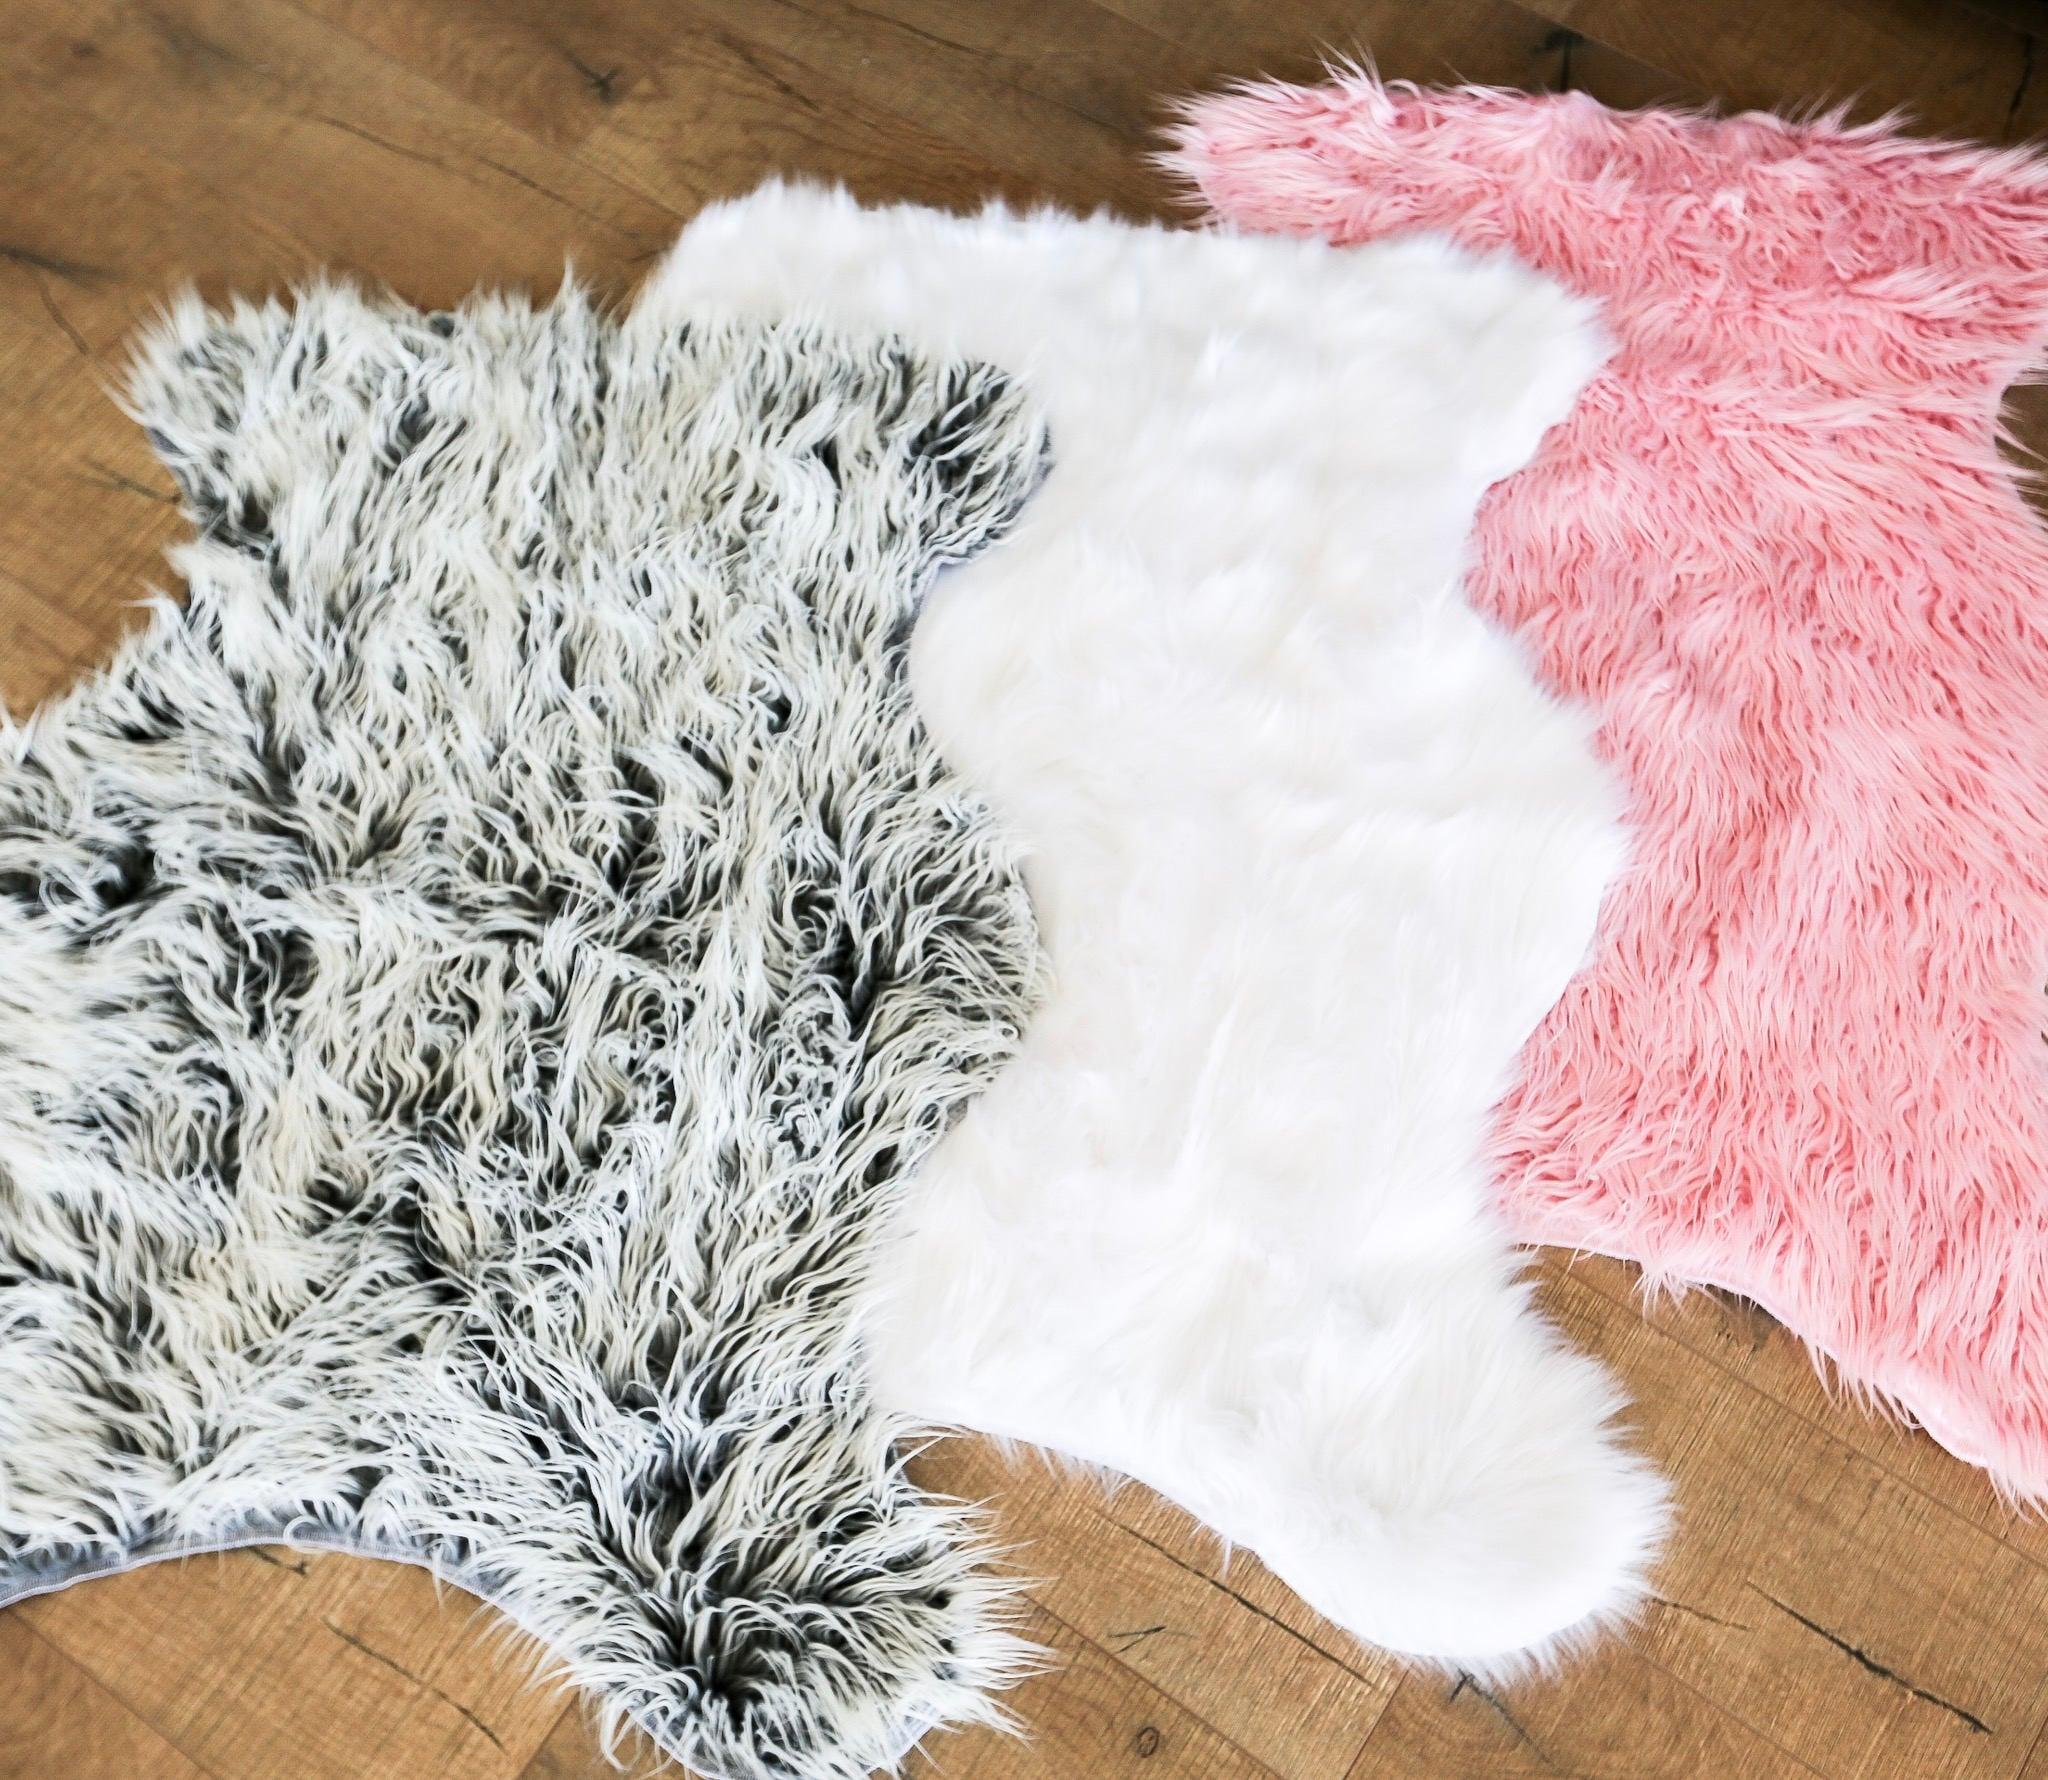 Faux Fur Rug White Fur Rug Grey Fur Rug Sheepskin Rug